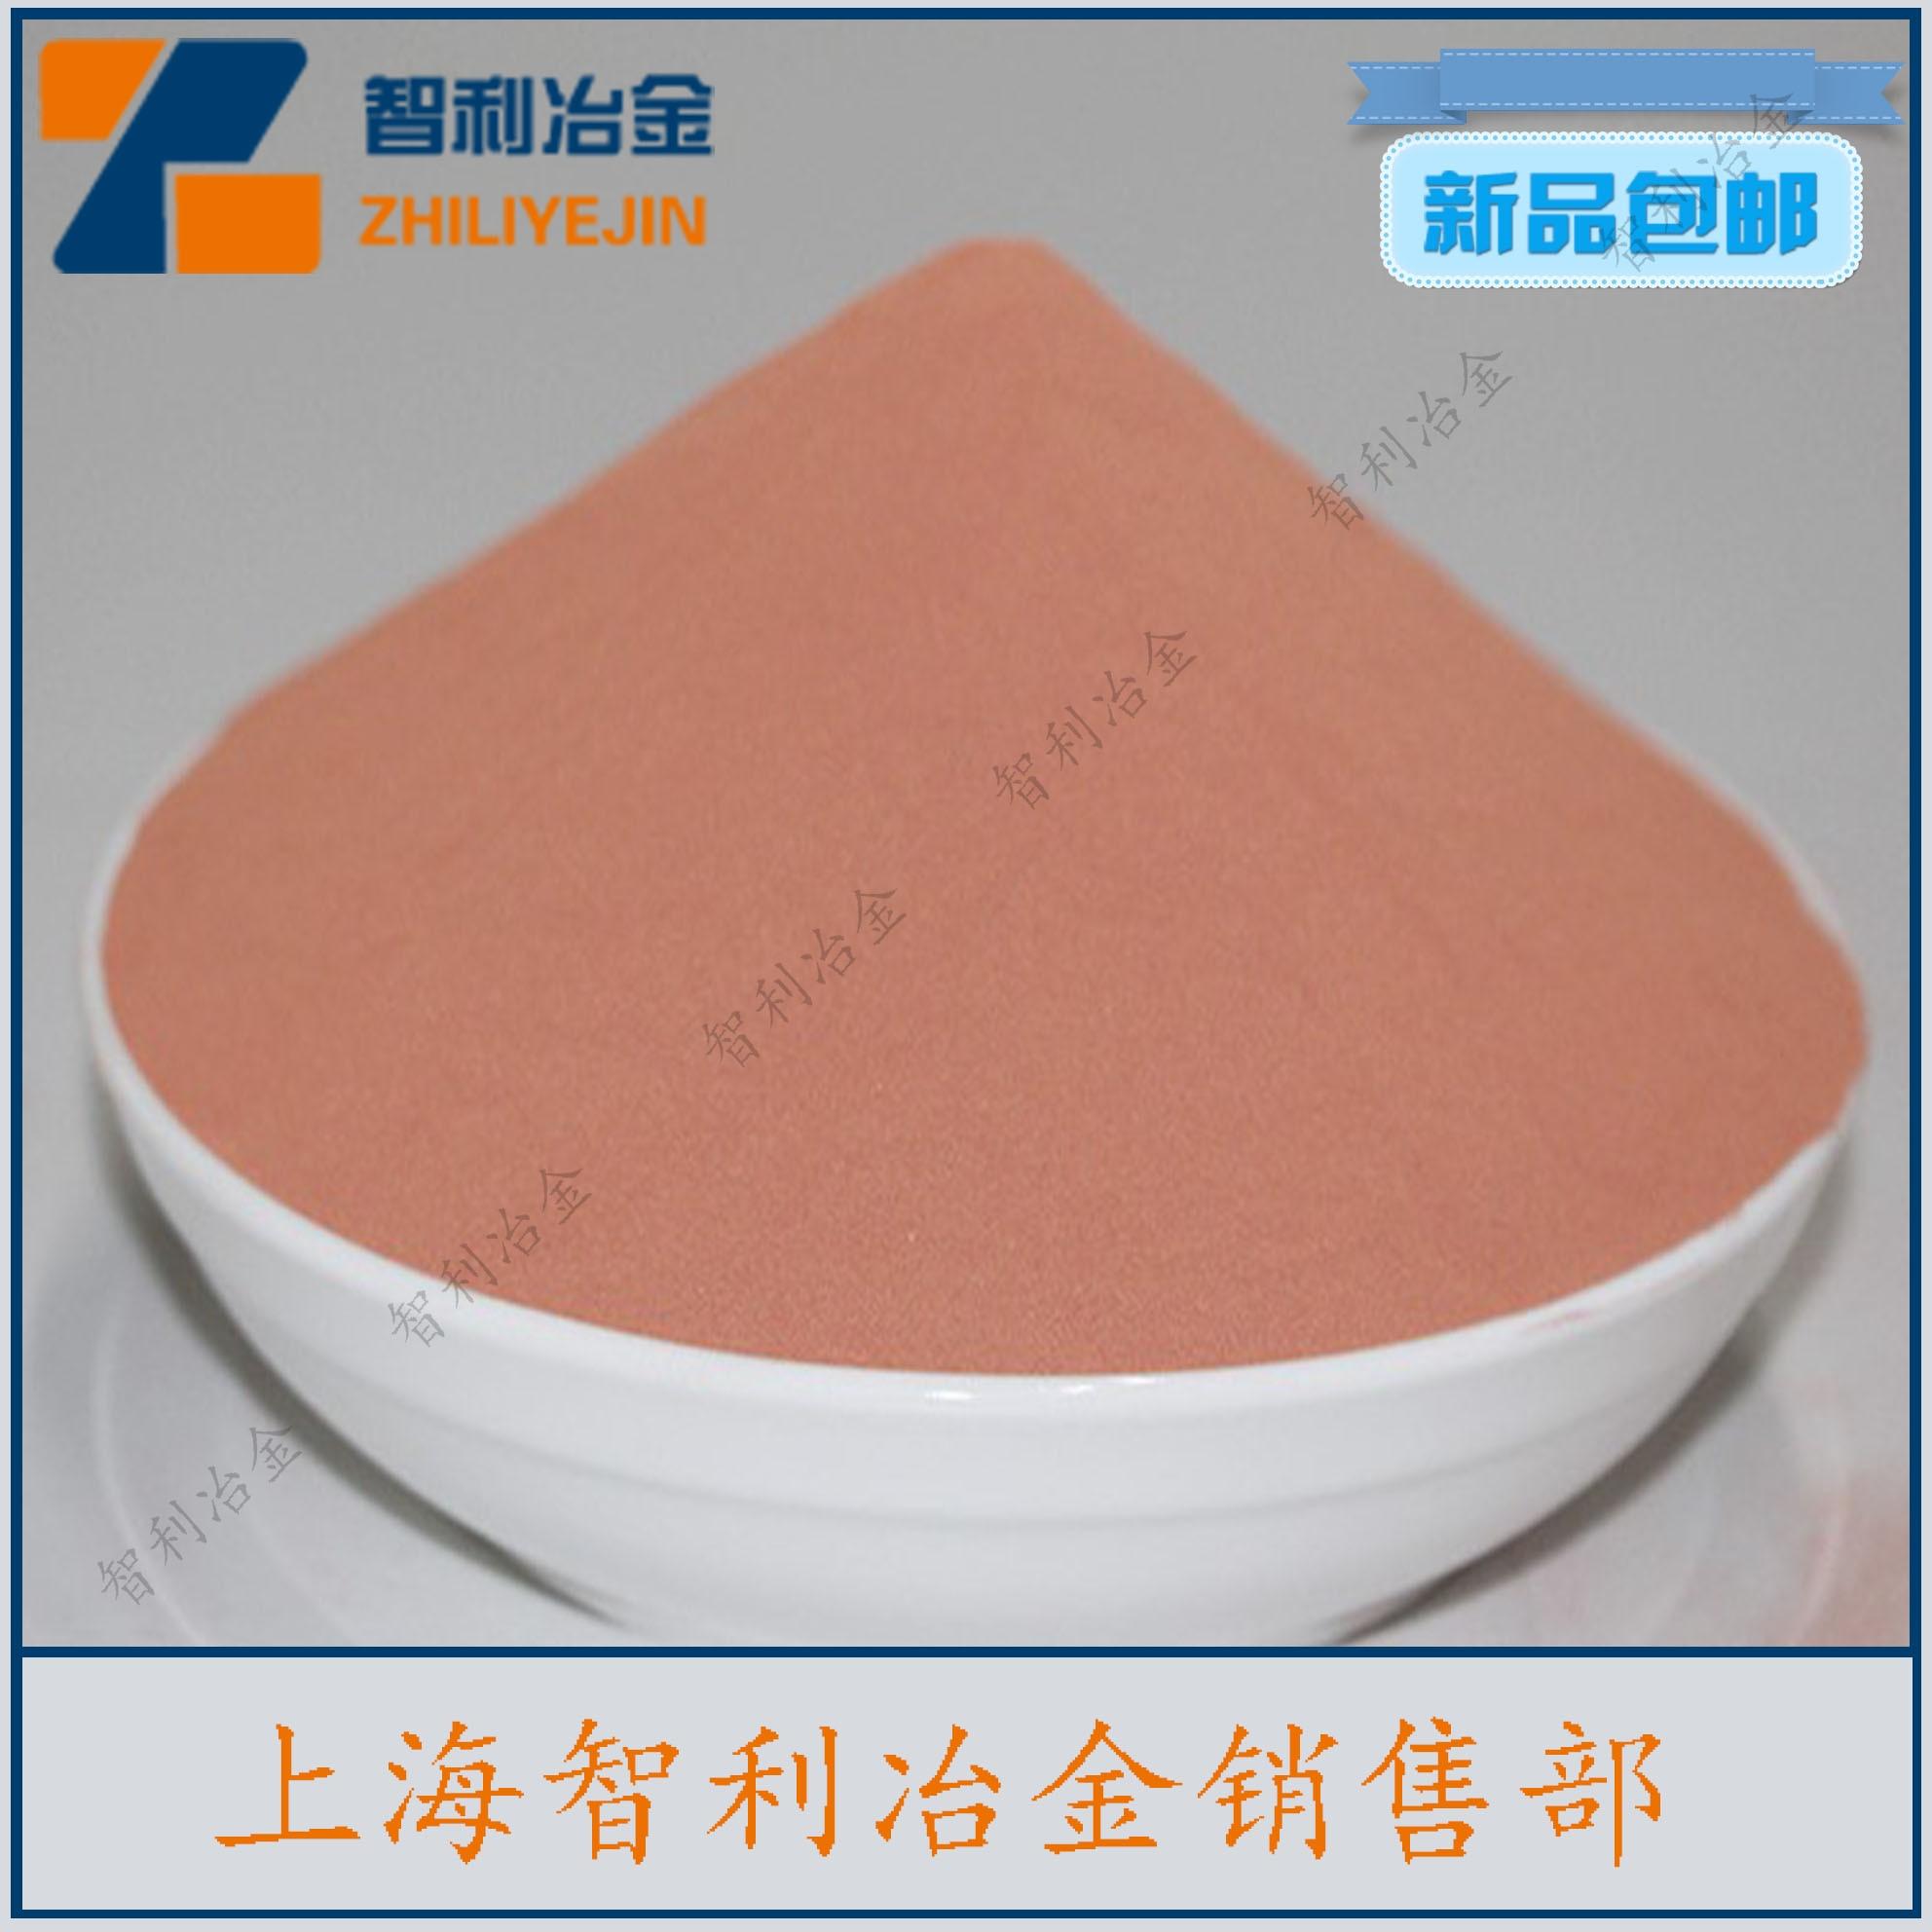 Copper Powder, Pure Copper Powder, Alloy Powder, Scientific Research high purity iron powder metallic iron powder superfine iron powder nano iron powder alloy powder